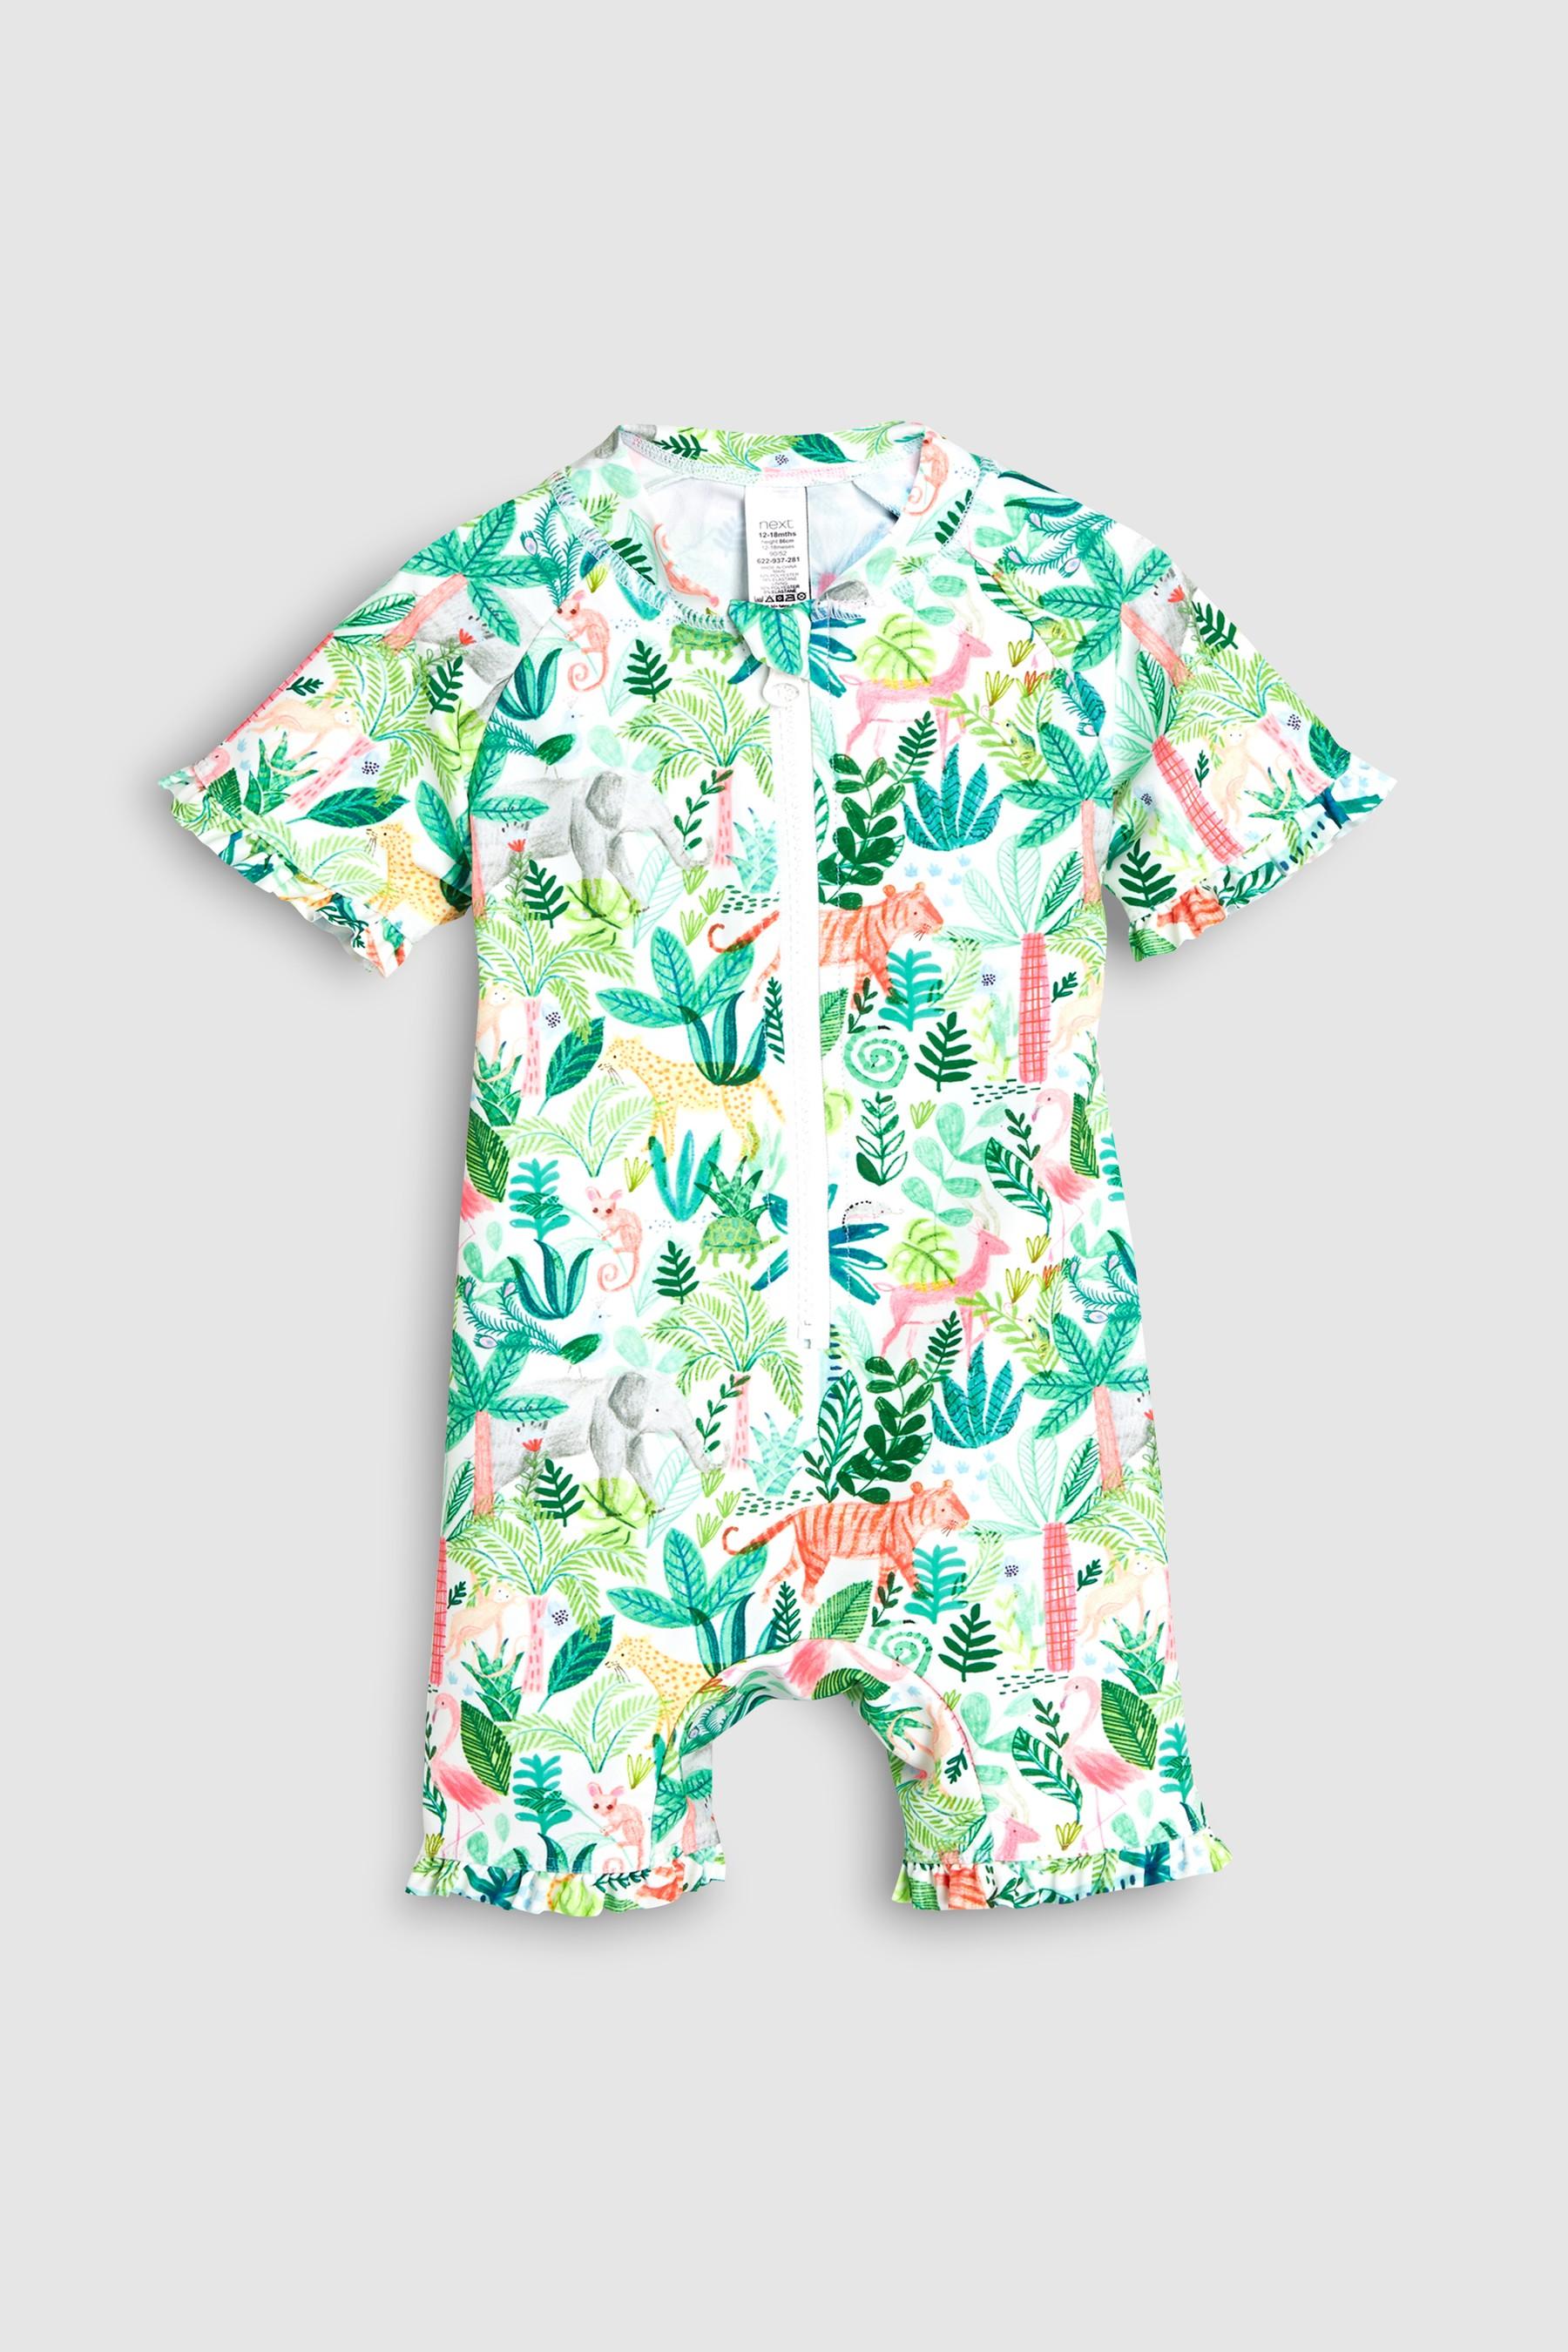 206e32f233769 Girls Next Jungle Print Sunsafe Suit (3mths-7yrs) - Green in 2019 ...